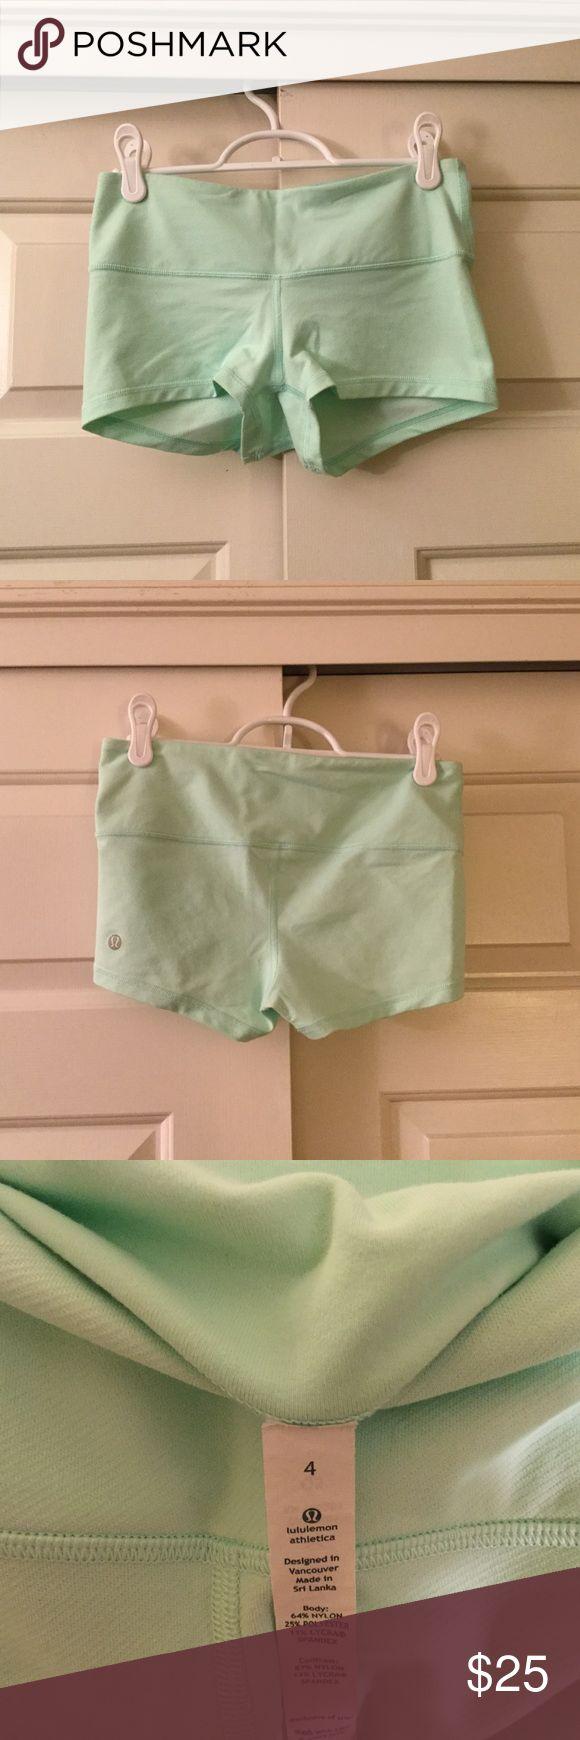 MINT LULULEMON SHORTS Mint shorts from lululemon. Size 4 and condition is very good! lululemon athletica Shorts